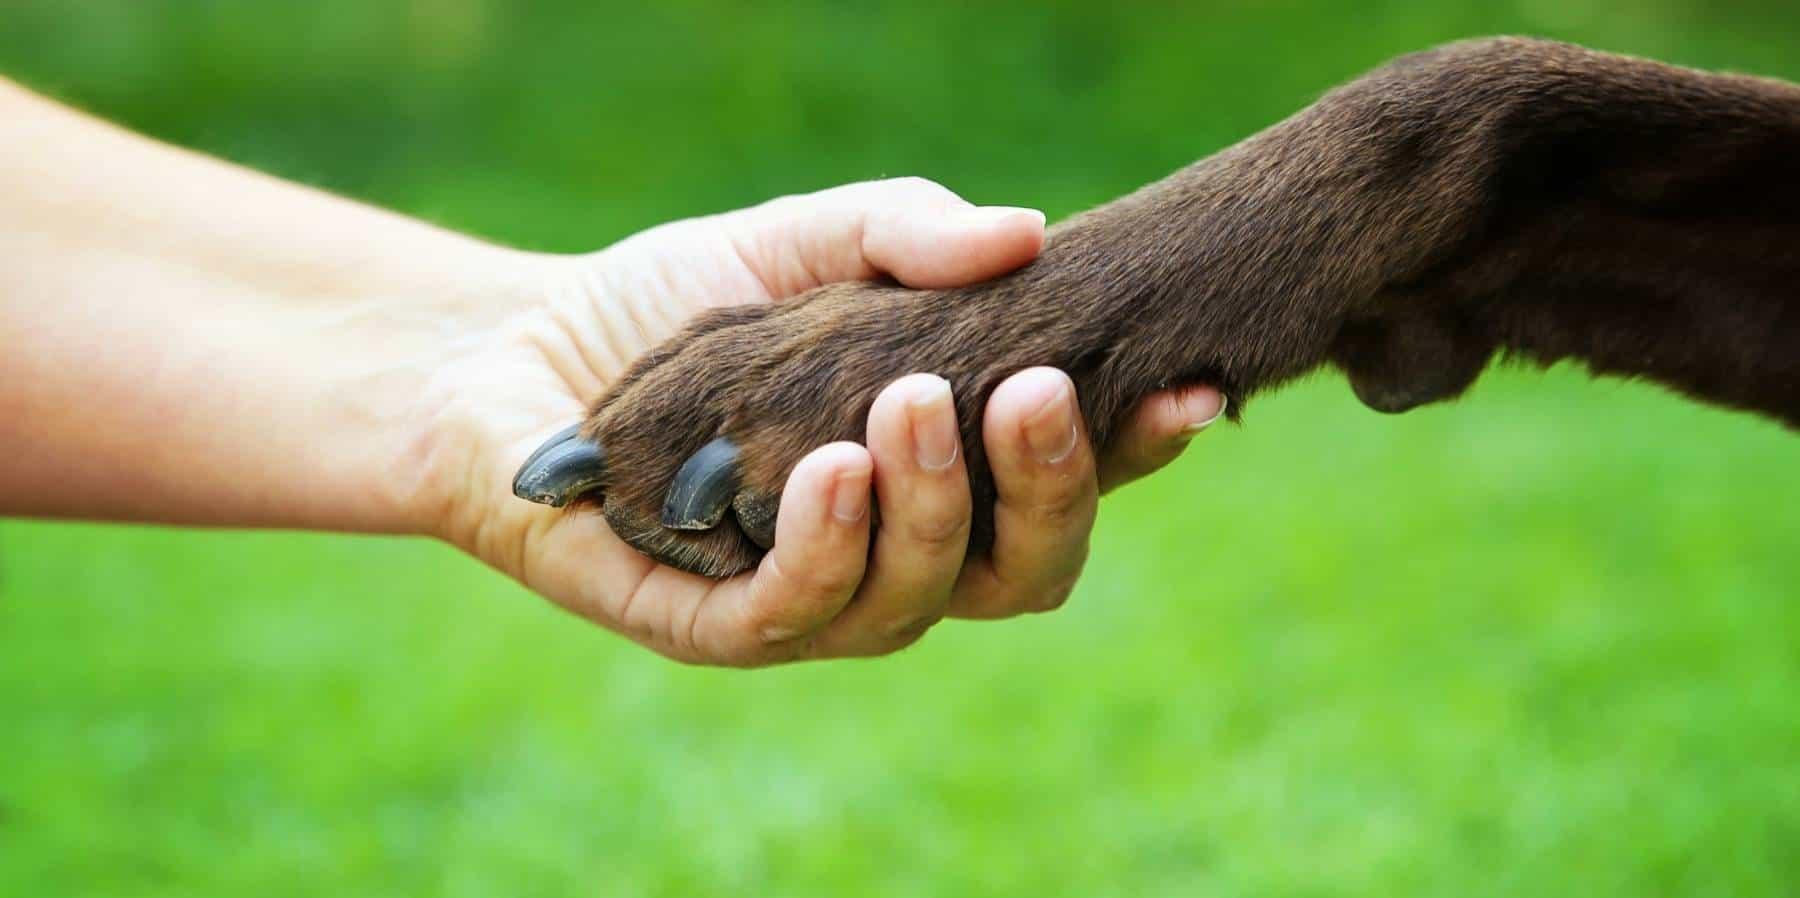 dog-obedience-services-near-me-sarasota-lakewood-ranch-bradenton-parrish-ellenton-palmetto-3